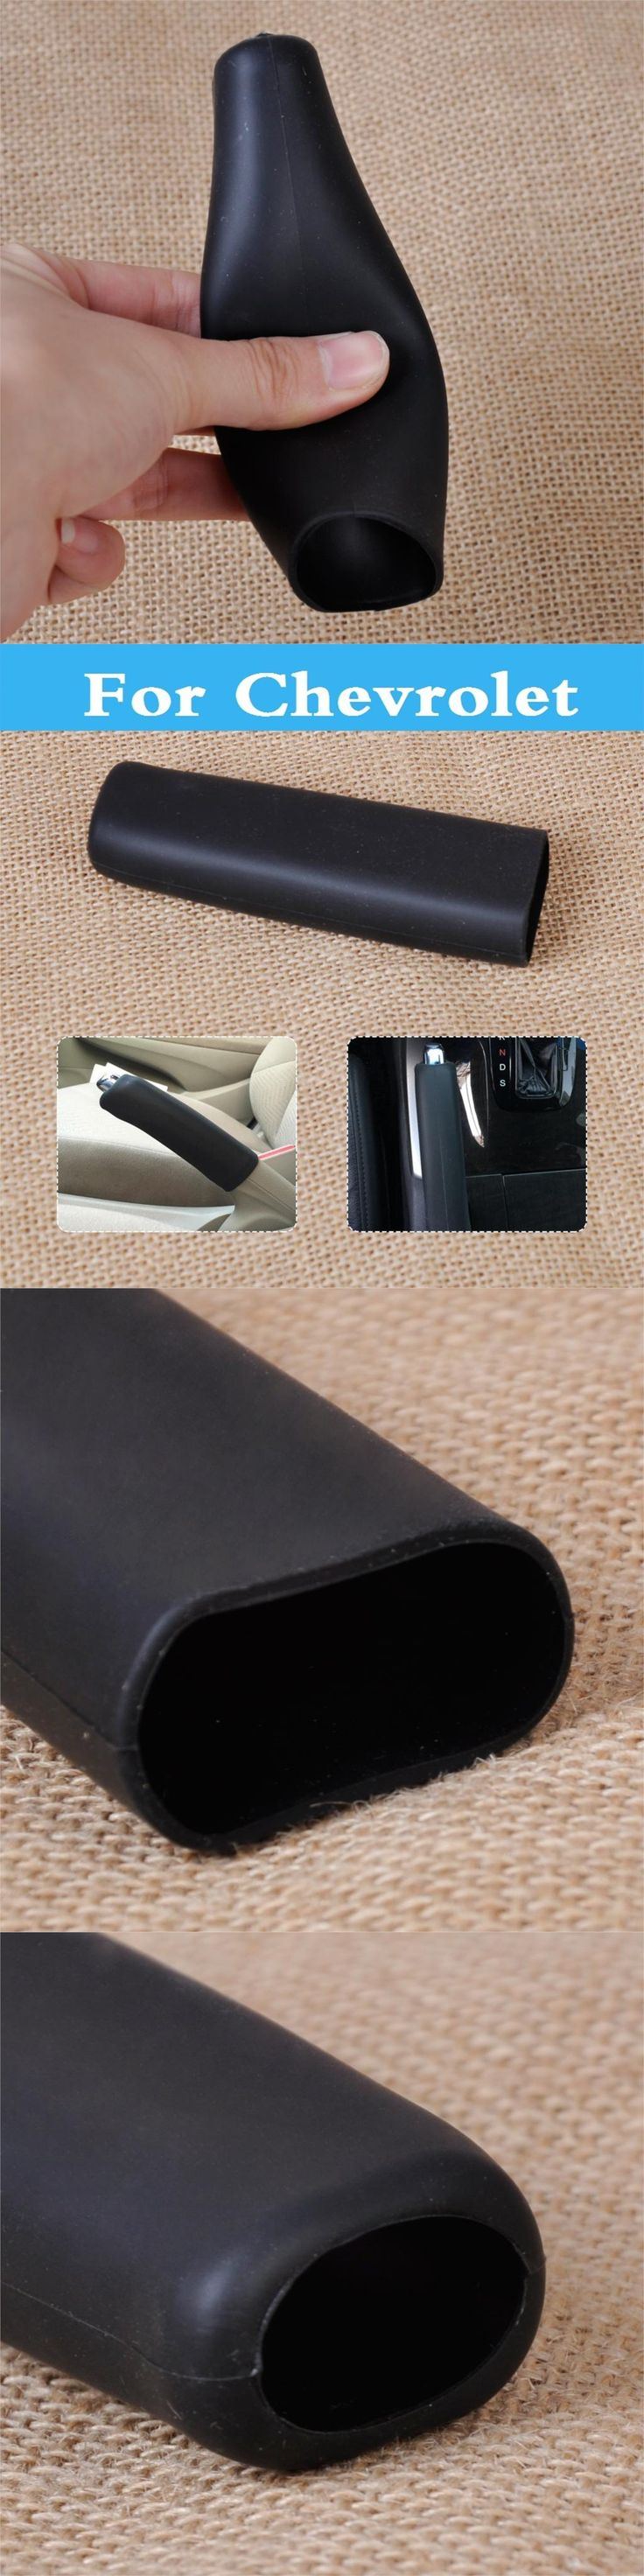 Handbrake Grip Car Anti Slip Parking Hand Brake Boot Cover For Chevrolet Carlo Mw Niva Sail Sonic Spark Lanos Malibu Metro Monte